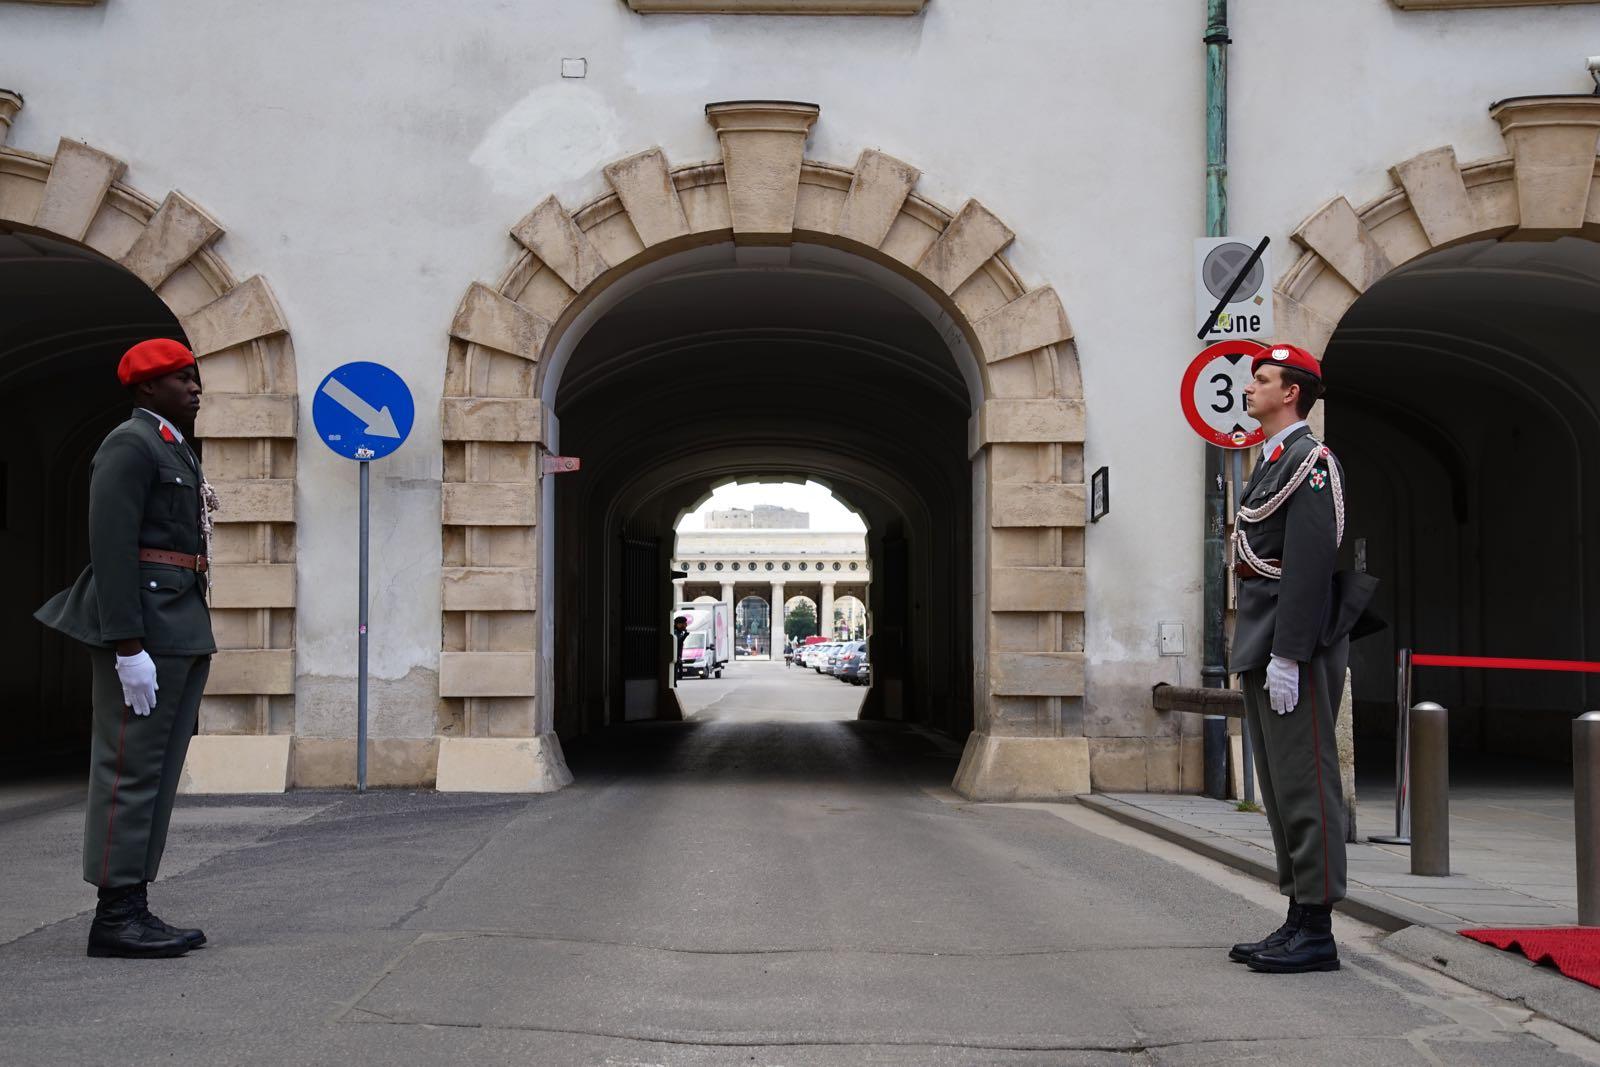 2019_03_05_4Gardekompanie_Empfang_KATAR_HBP_Hofburg - 2 of 21